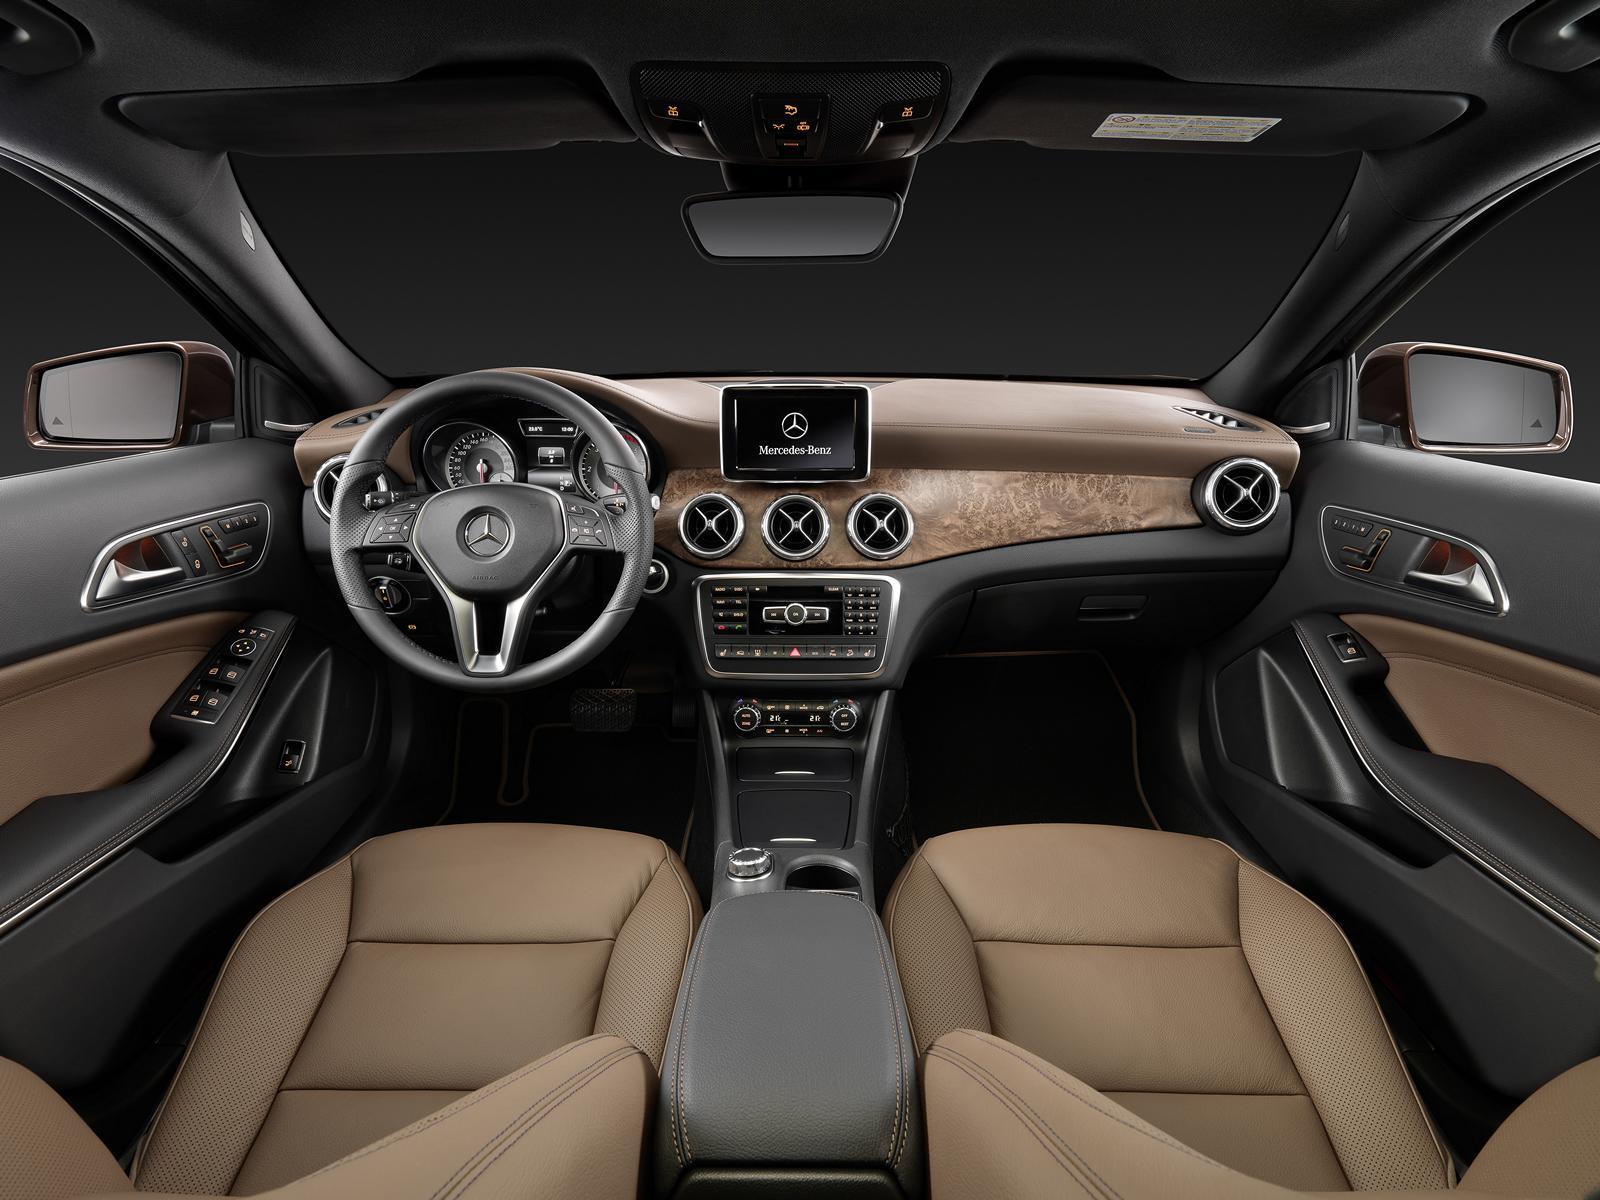 Mercedes benz gla die ersten bilder racingblog cars for 2013 mercedes benz gla